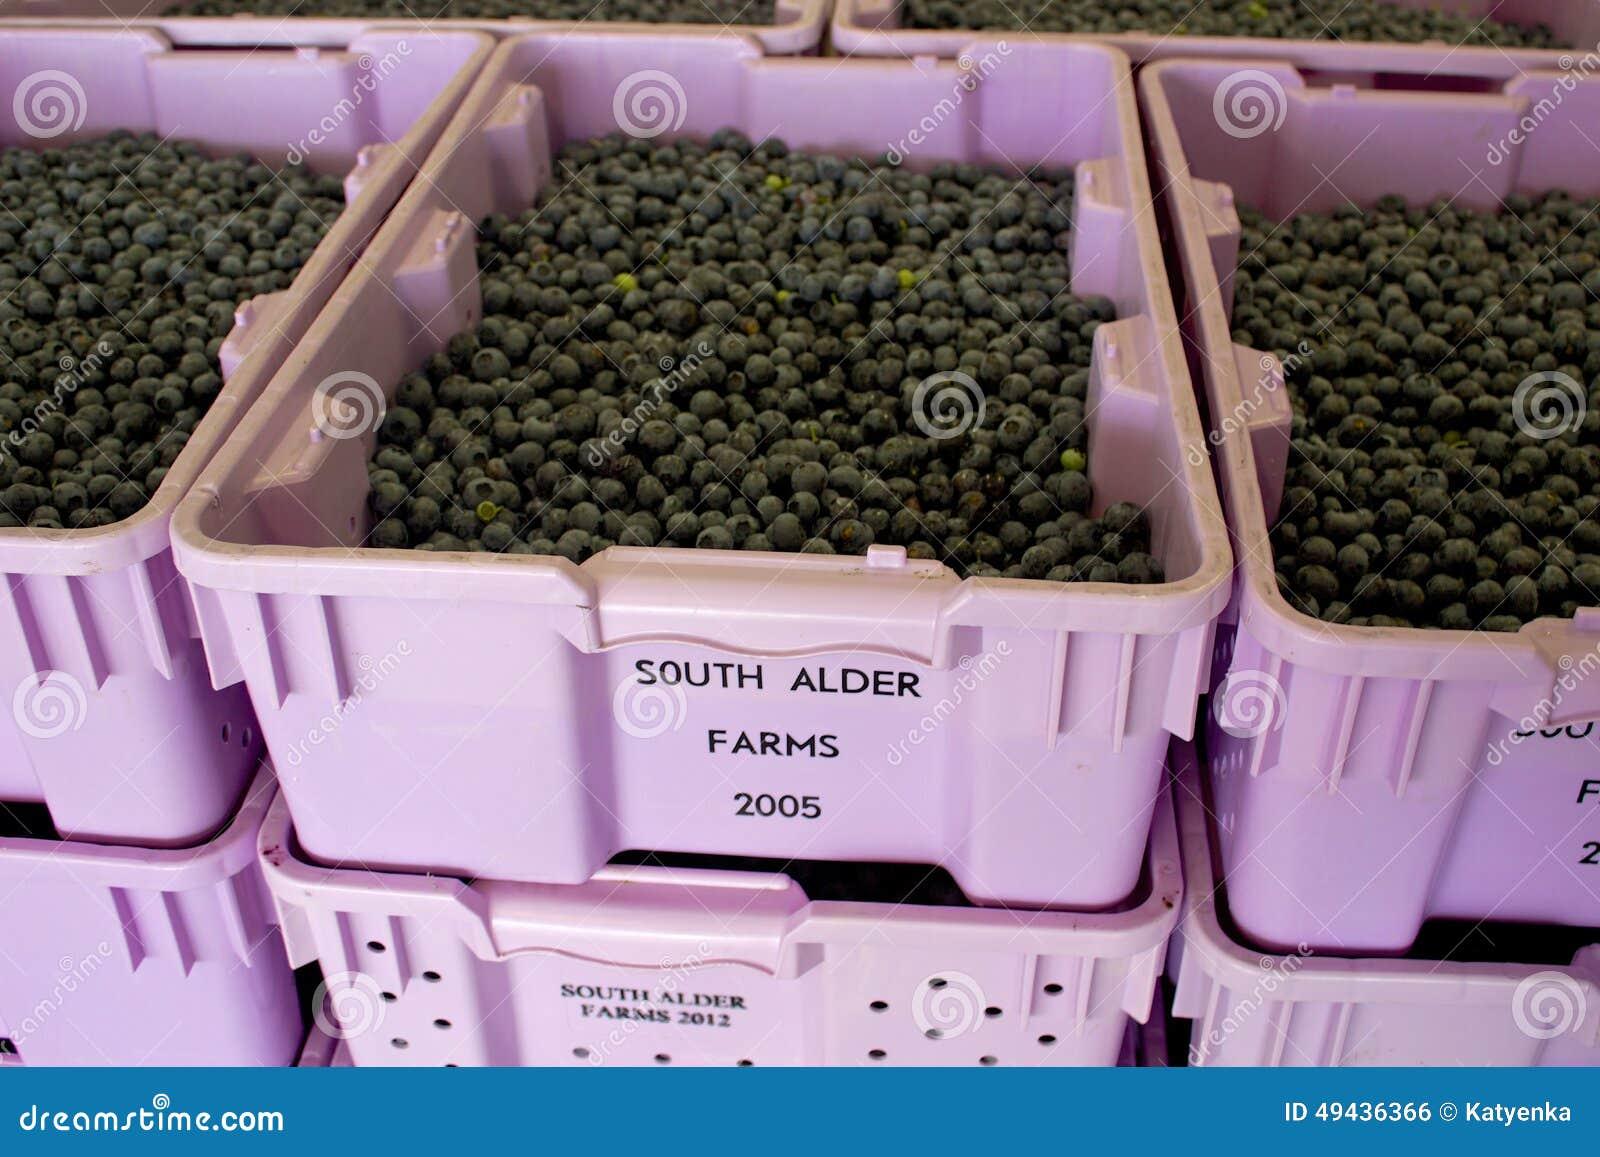 Freshly picked high-bush blueberries ready for sorting